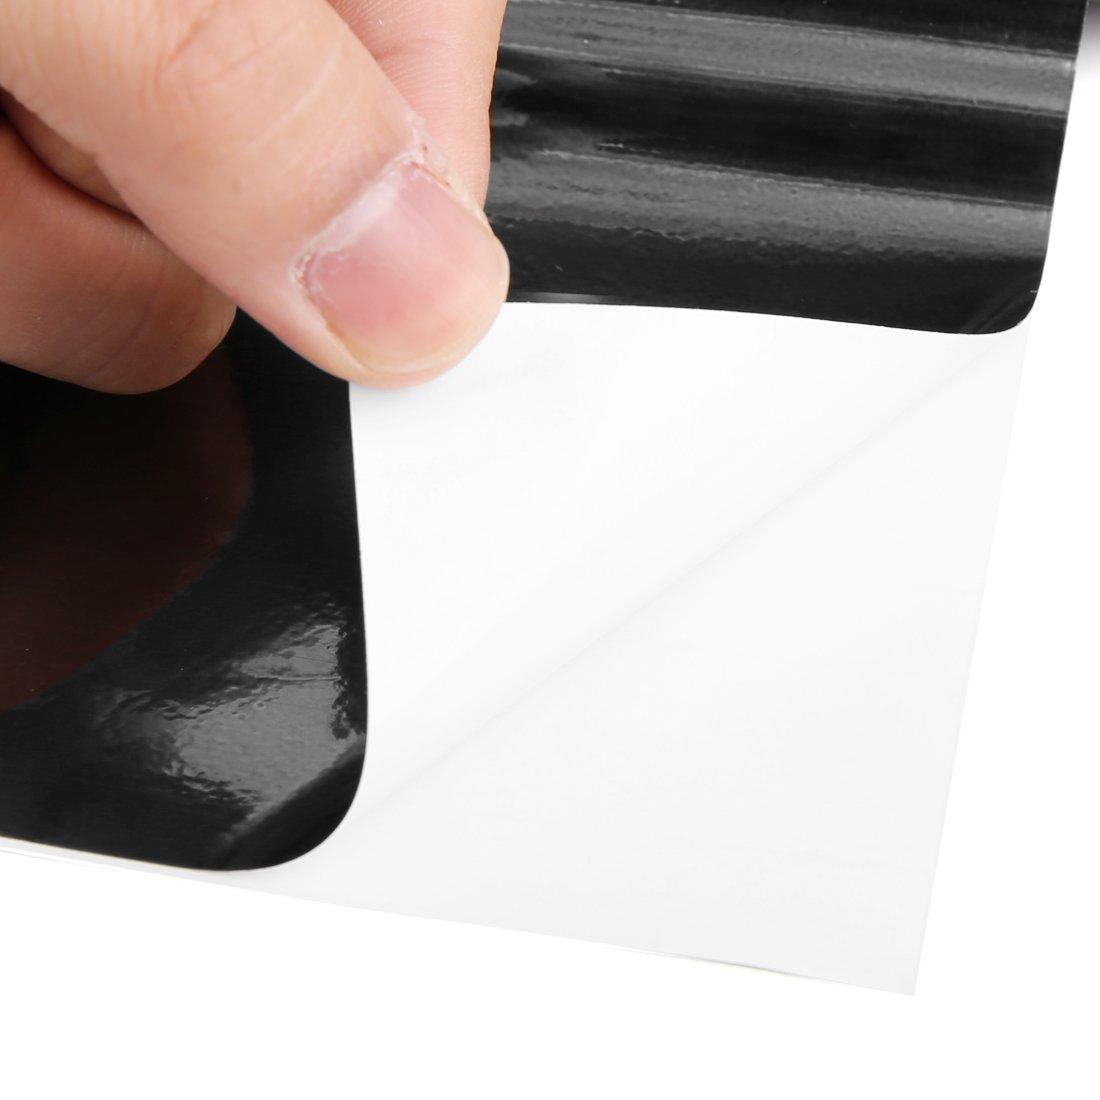 uxcell Chrome Black Bubble Free Self Adhesive Car Vinyl Film Sticker Decal 152cm x 30cm a18010800ux0157